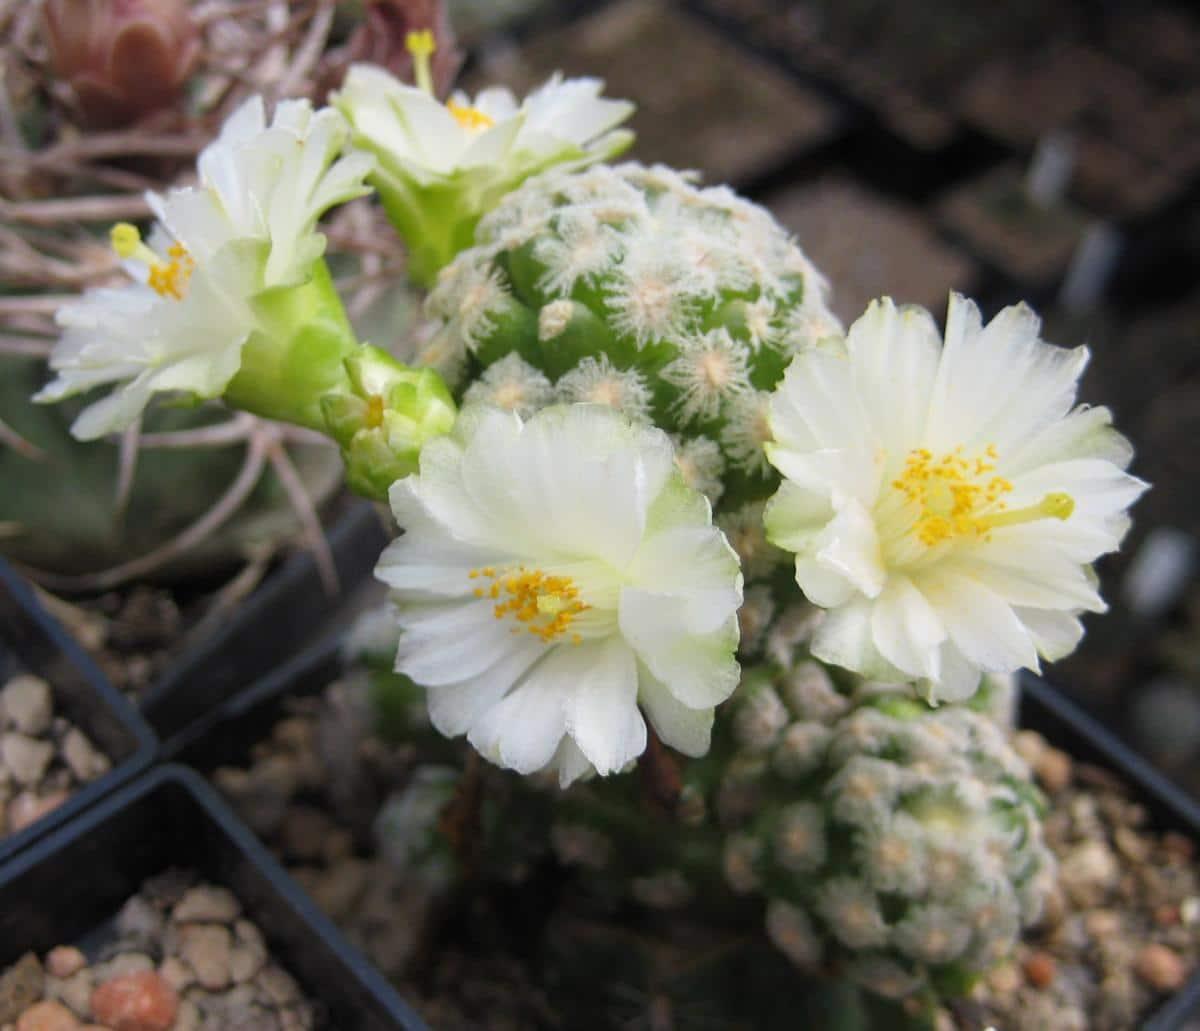 La Mammillaria theresae es un cactus pequeño